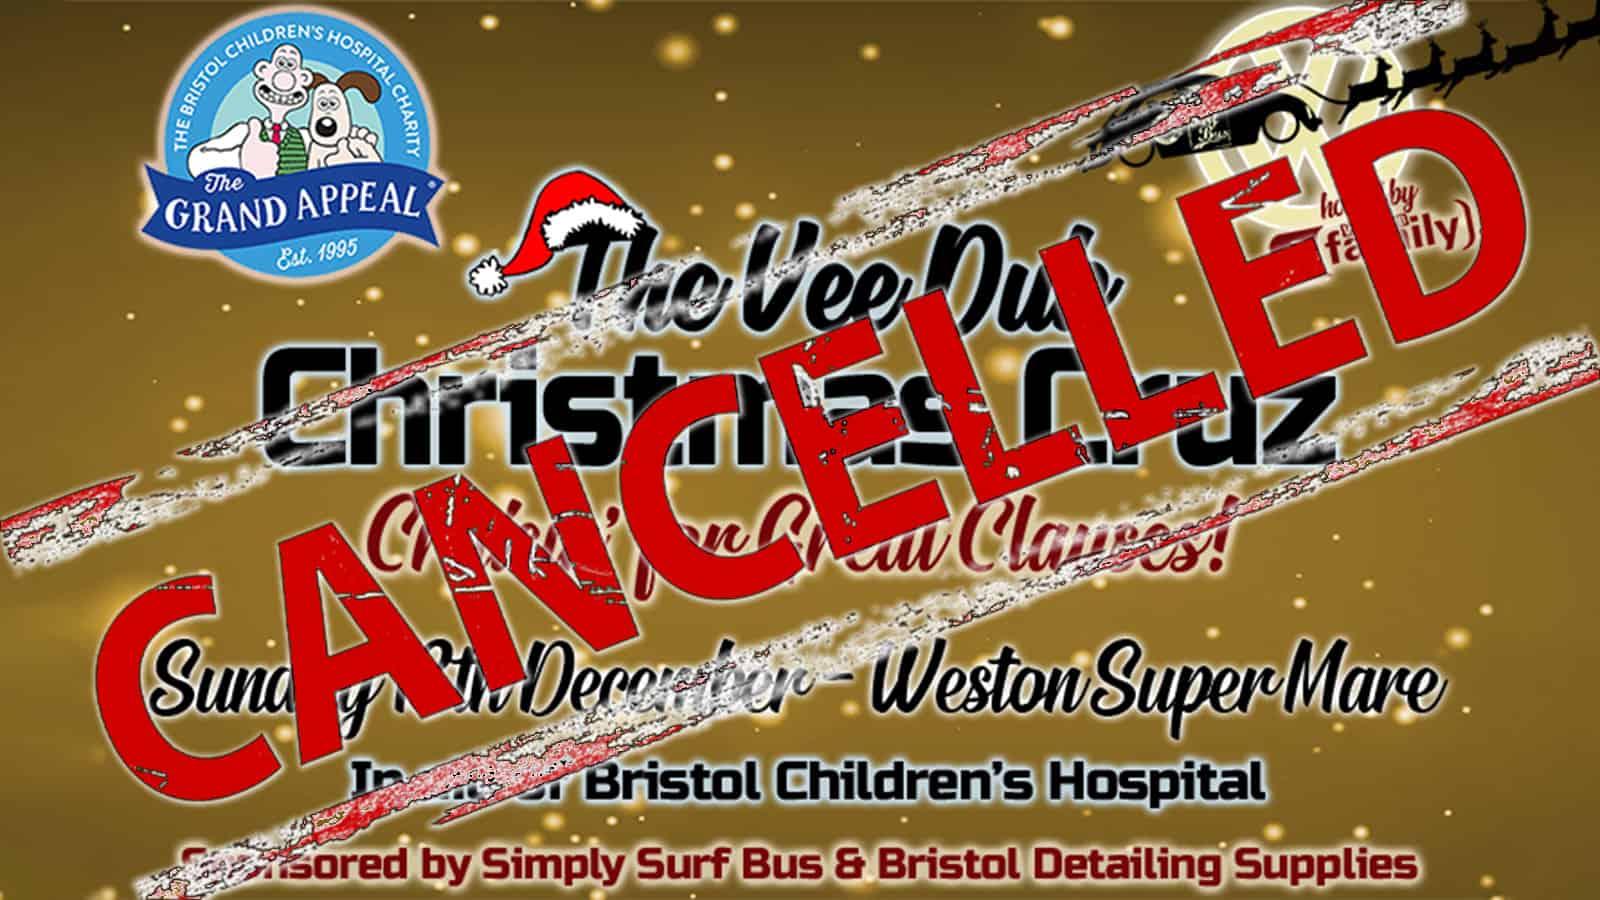 Vee Dub Family Christmas Cruz 2020 Cancelled Weston Supermare